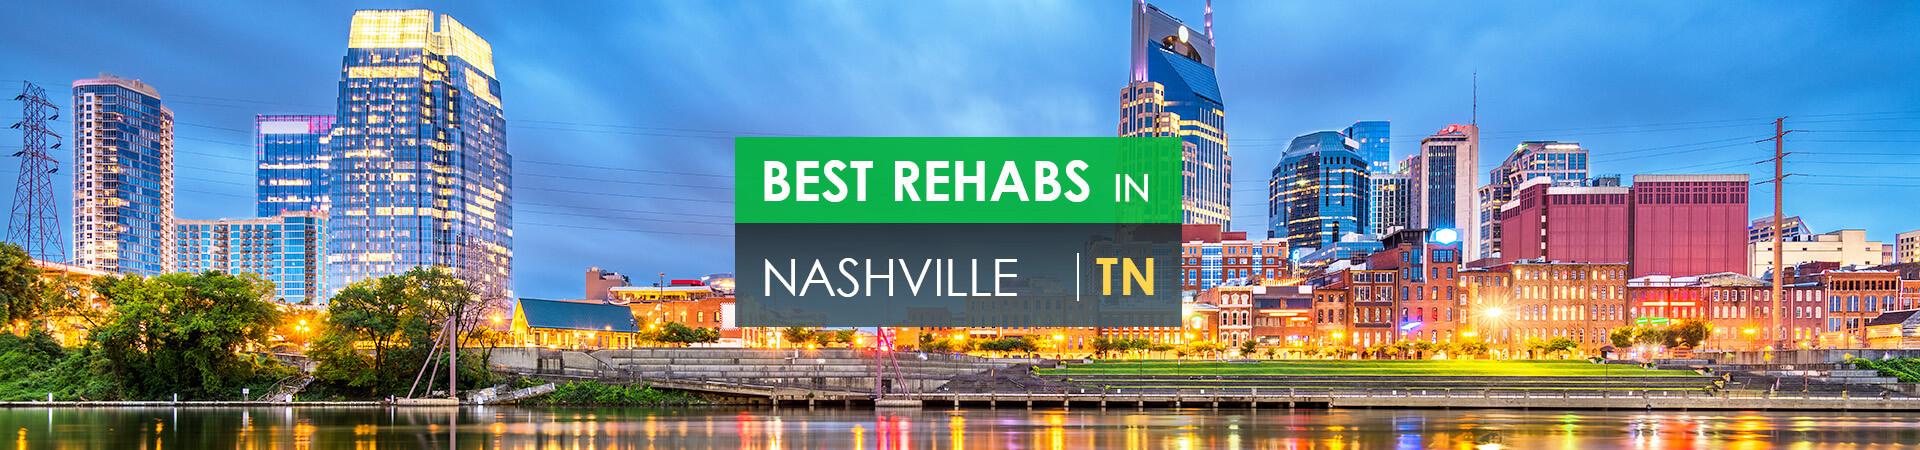 Best rehabs in Nashville, TN